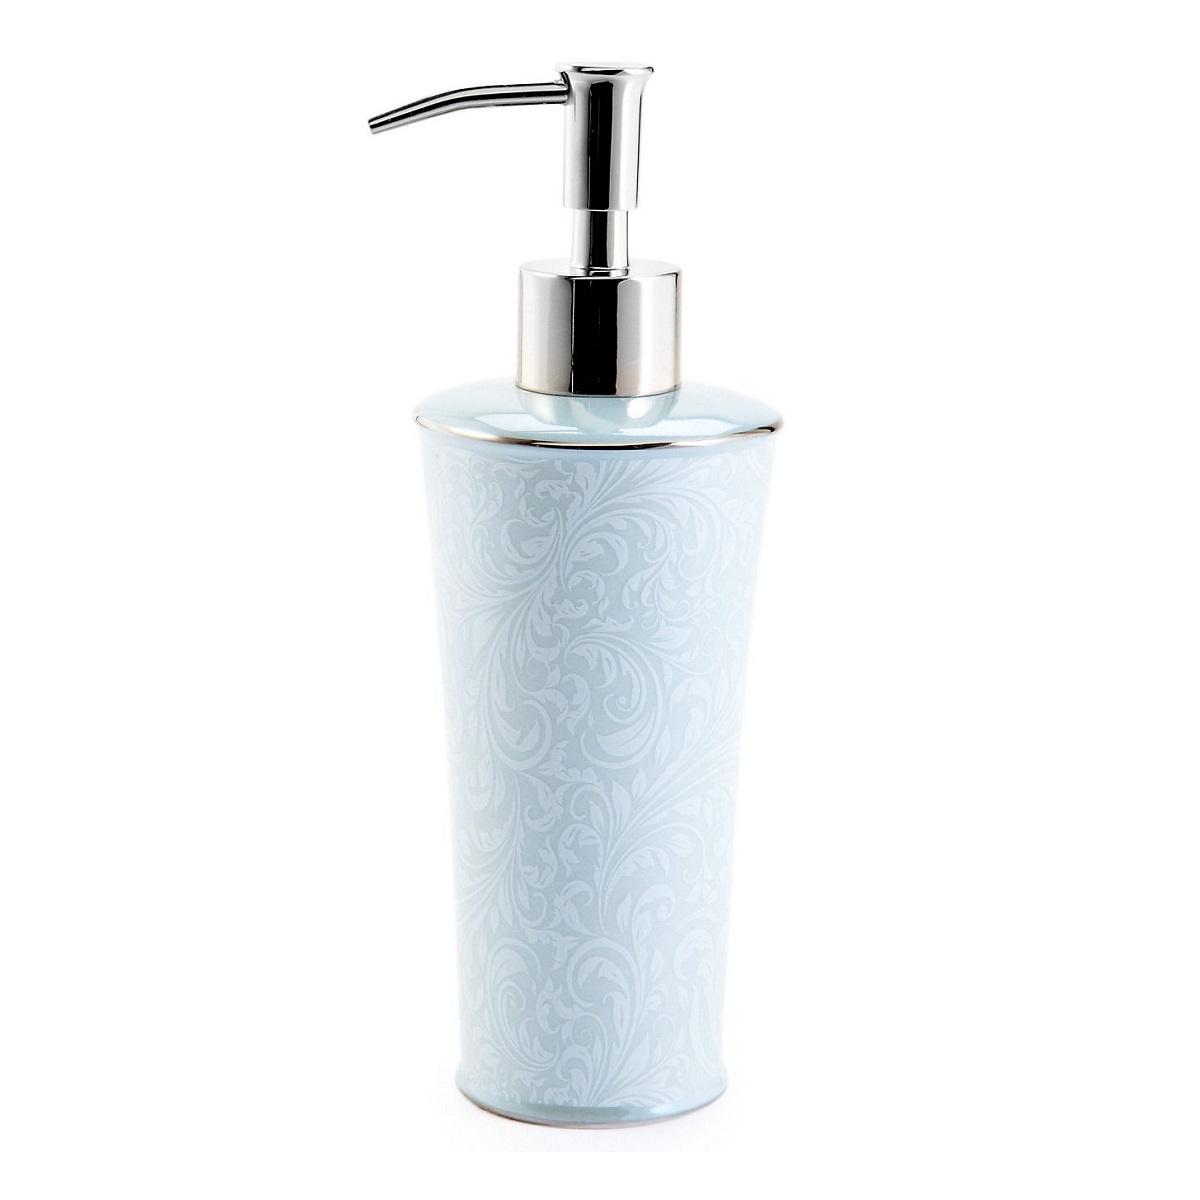 Диспенсер для мыла Kassatex Bedminster Scroll Surf Spray, ATB-LD-SFS, Фарфор